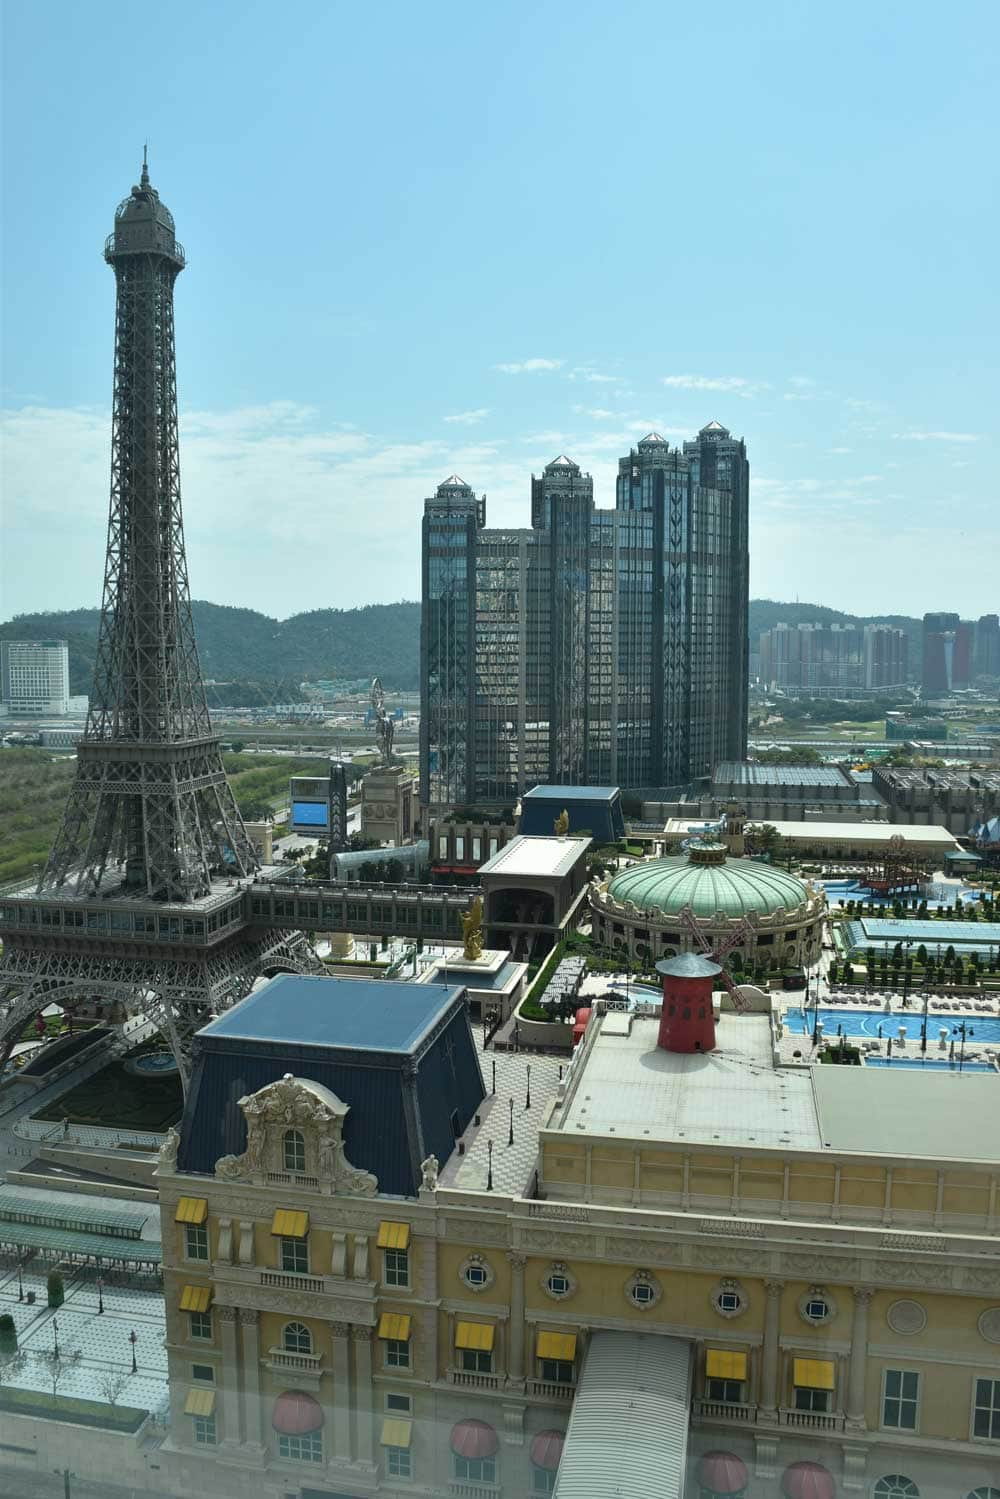 Studio City Macau from the Parisian Macao